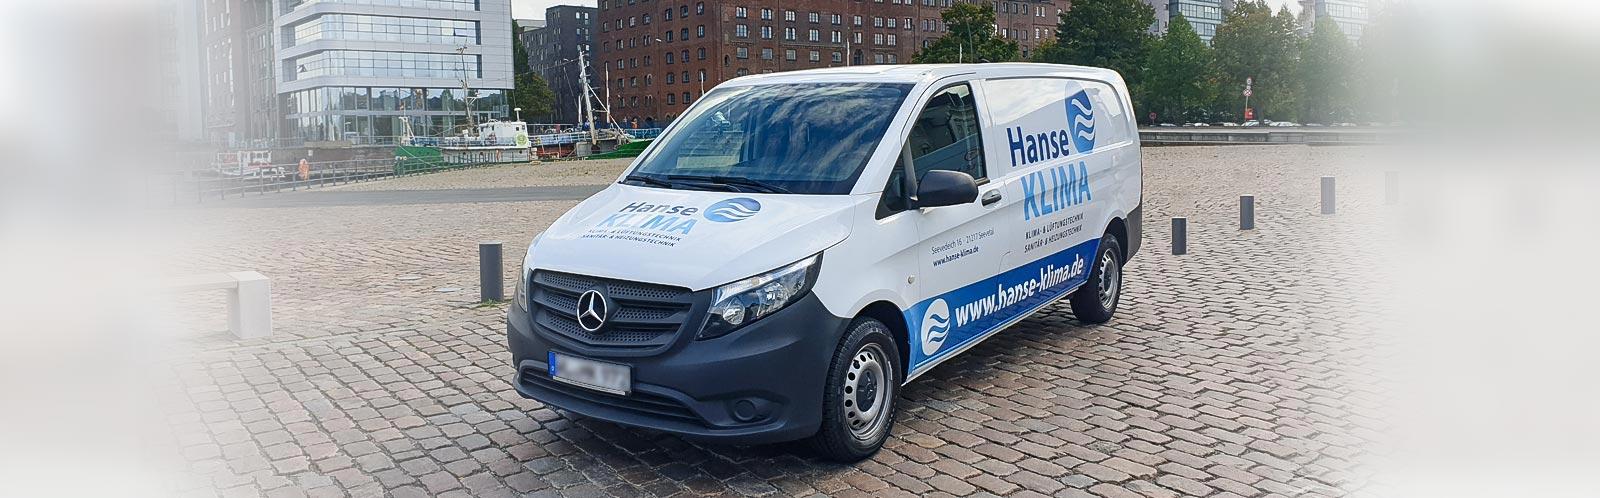 Fahrzeugbeschriftung Transporter Hanse Klima 1